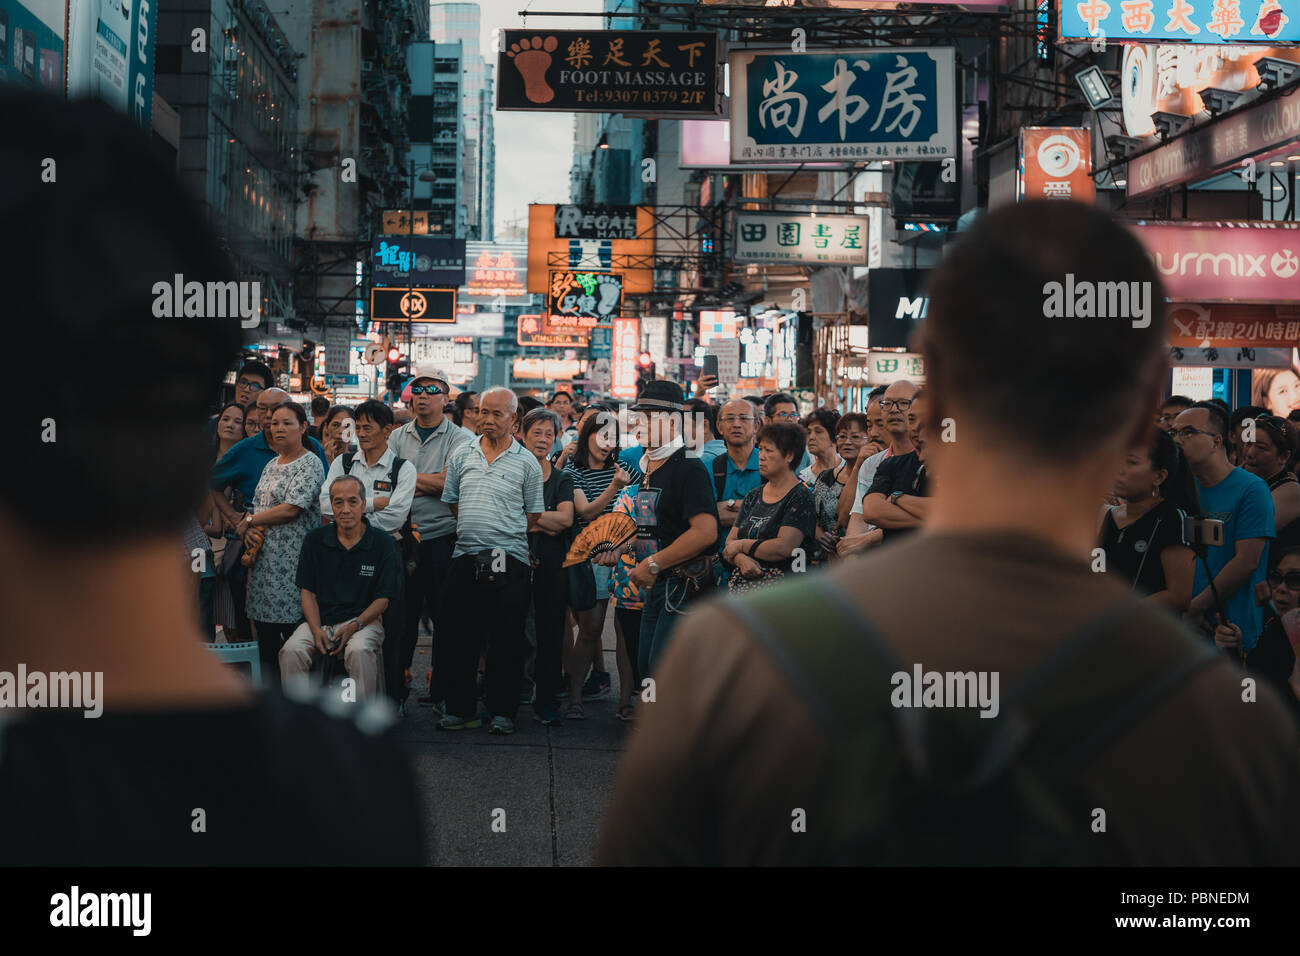 Luglio 28, 2018 Hong Kong: Mong Kok cultura di strada. Persone che guardano un musicista di strada prestazioni a Sai Yeung Choi Street, Mongkok in Hong Kong. Immagini Stock